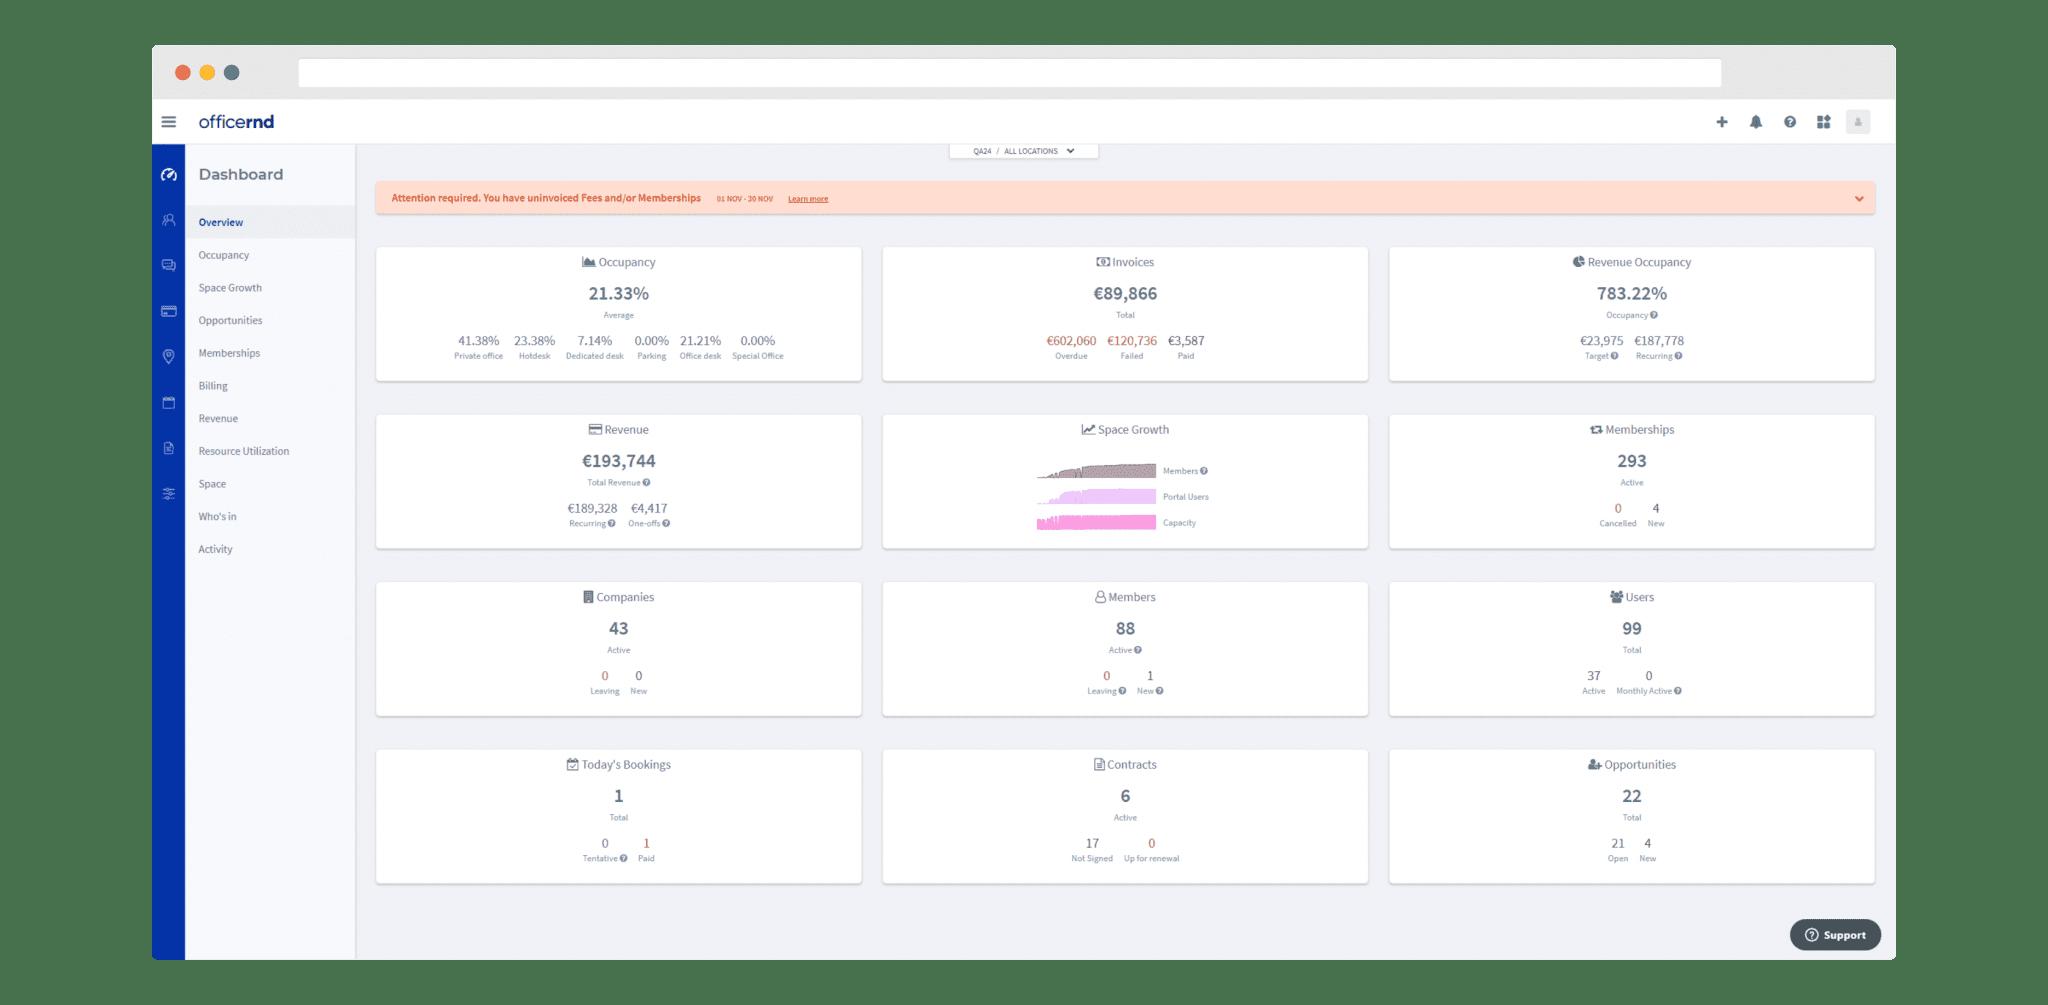 Dashboard | OfficeRnD